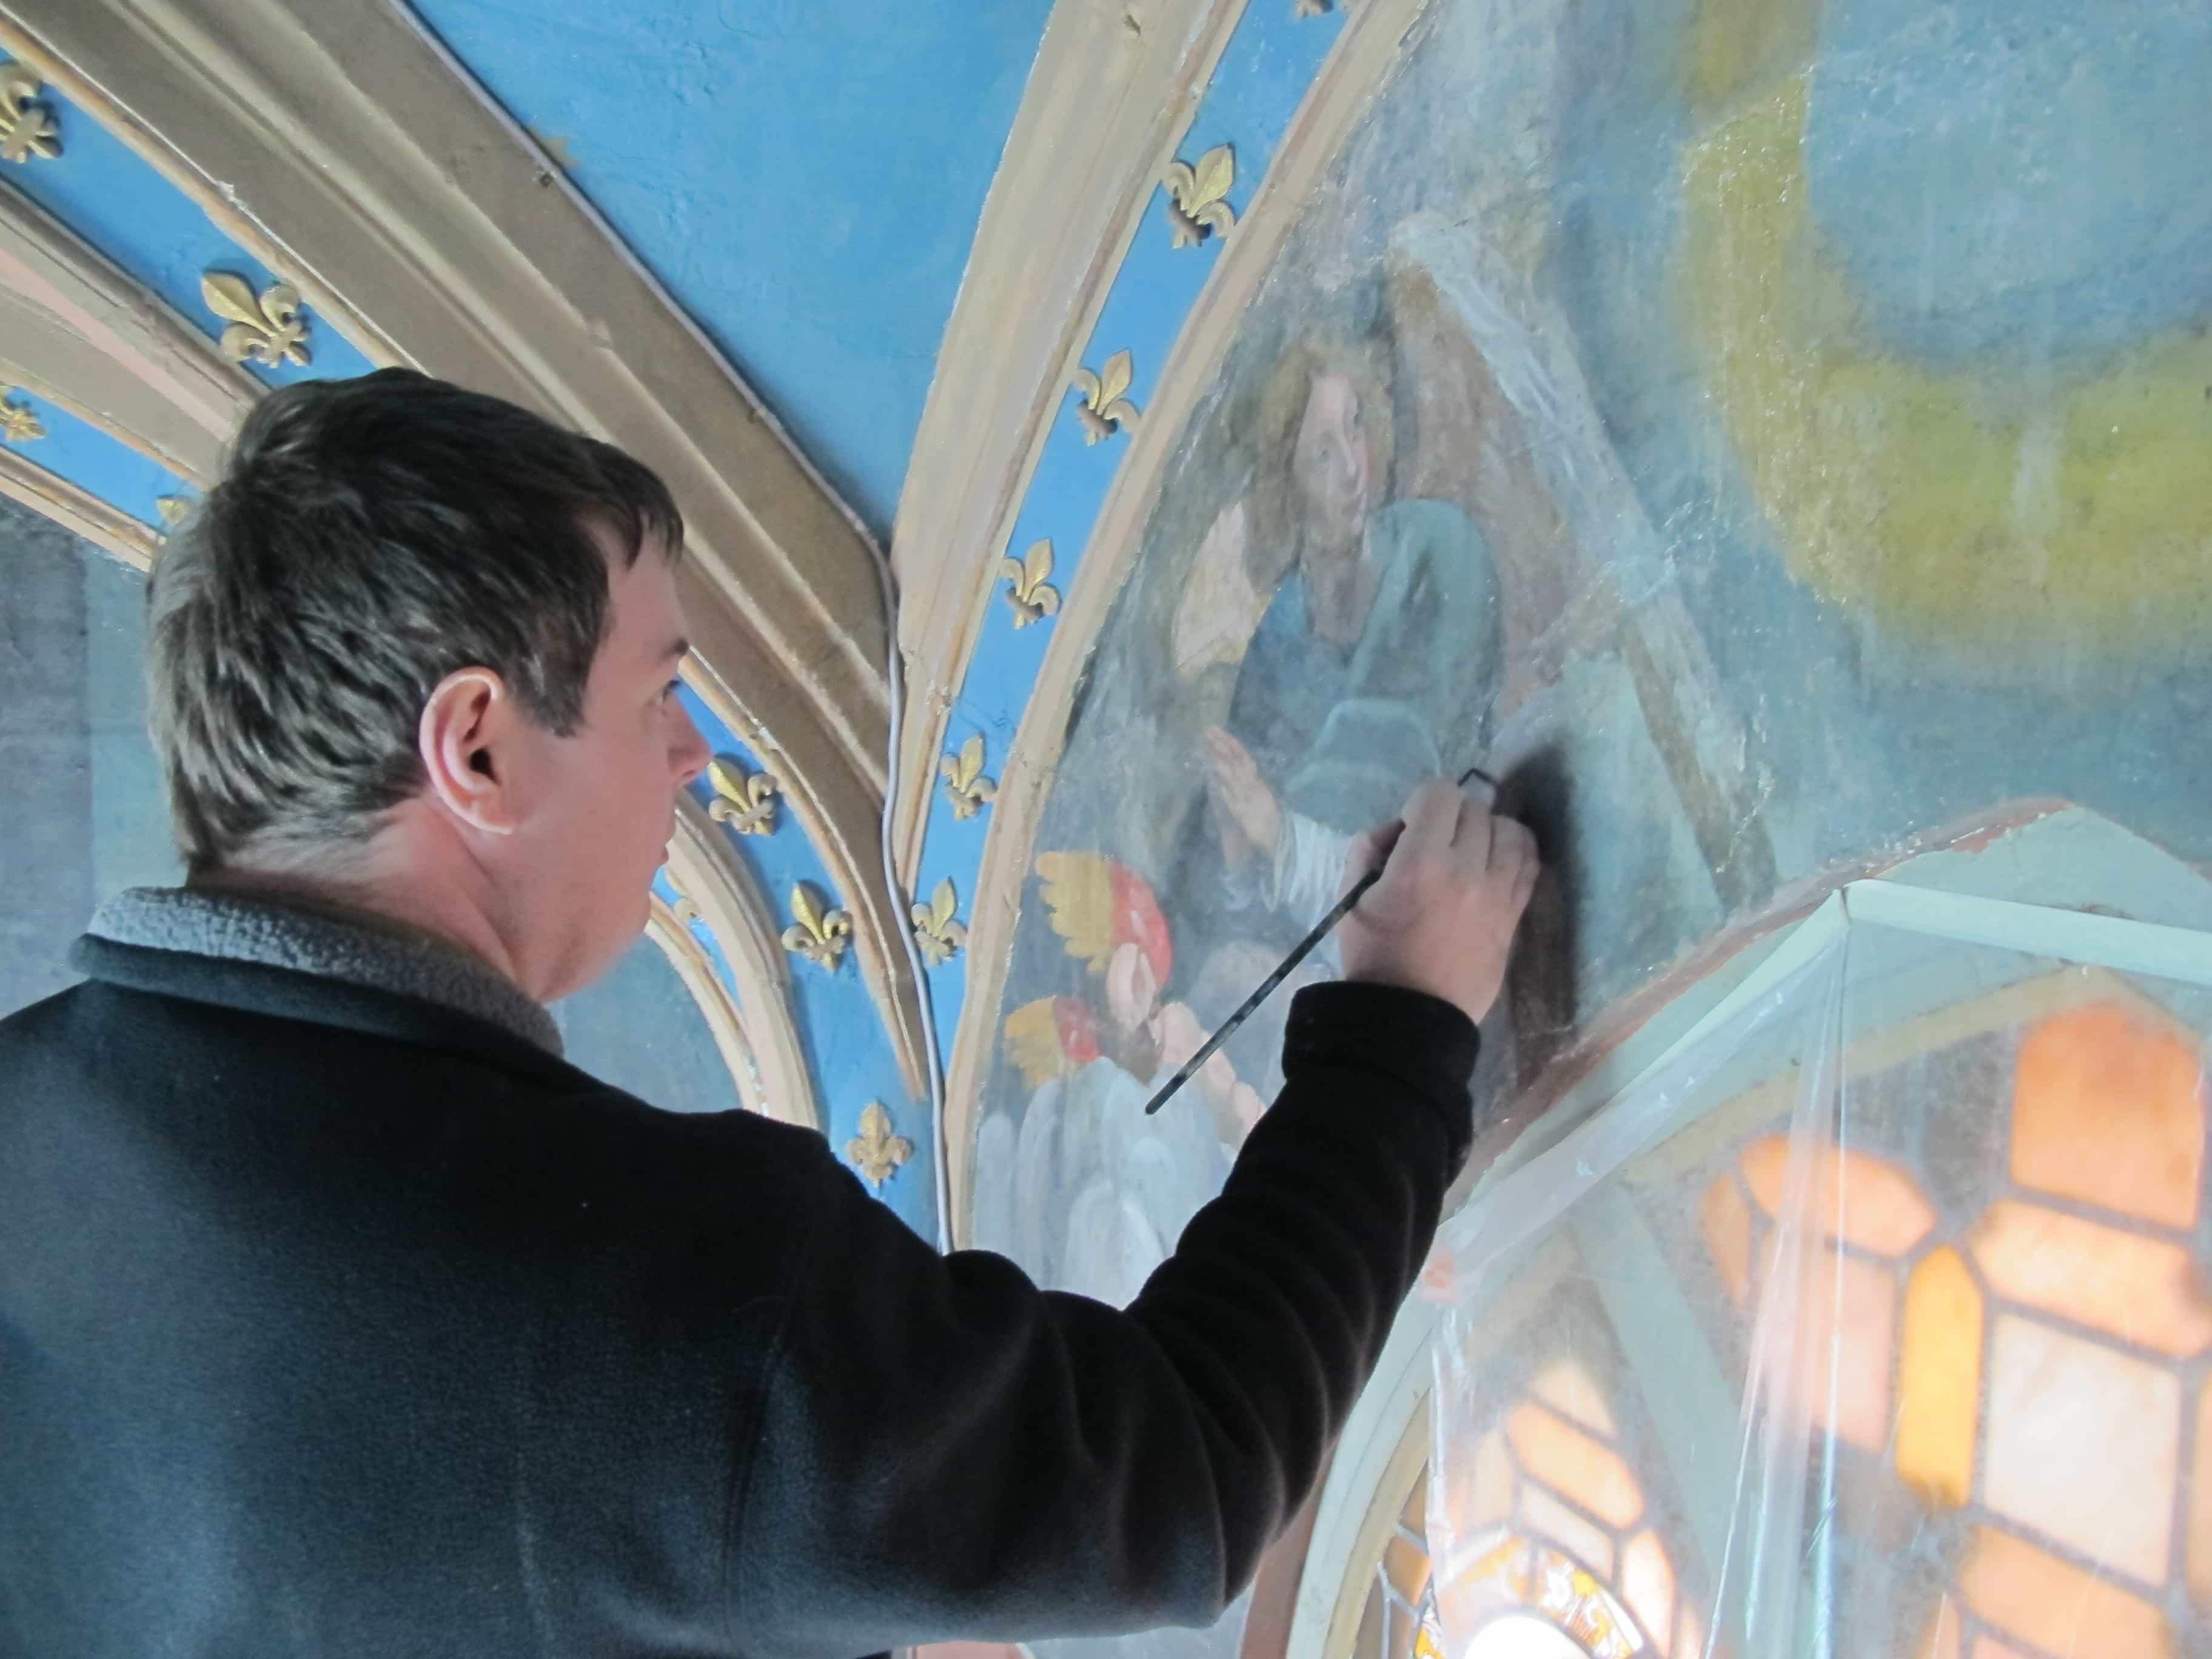 restauration conservation peinture murale